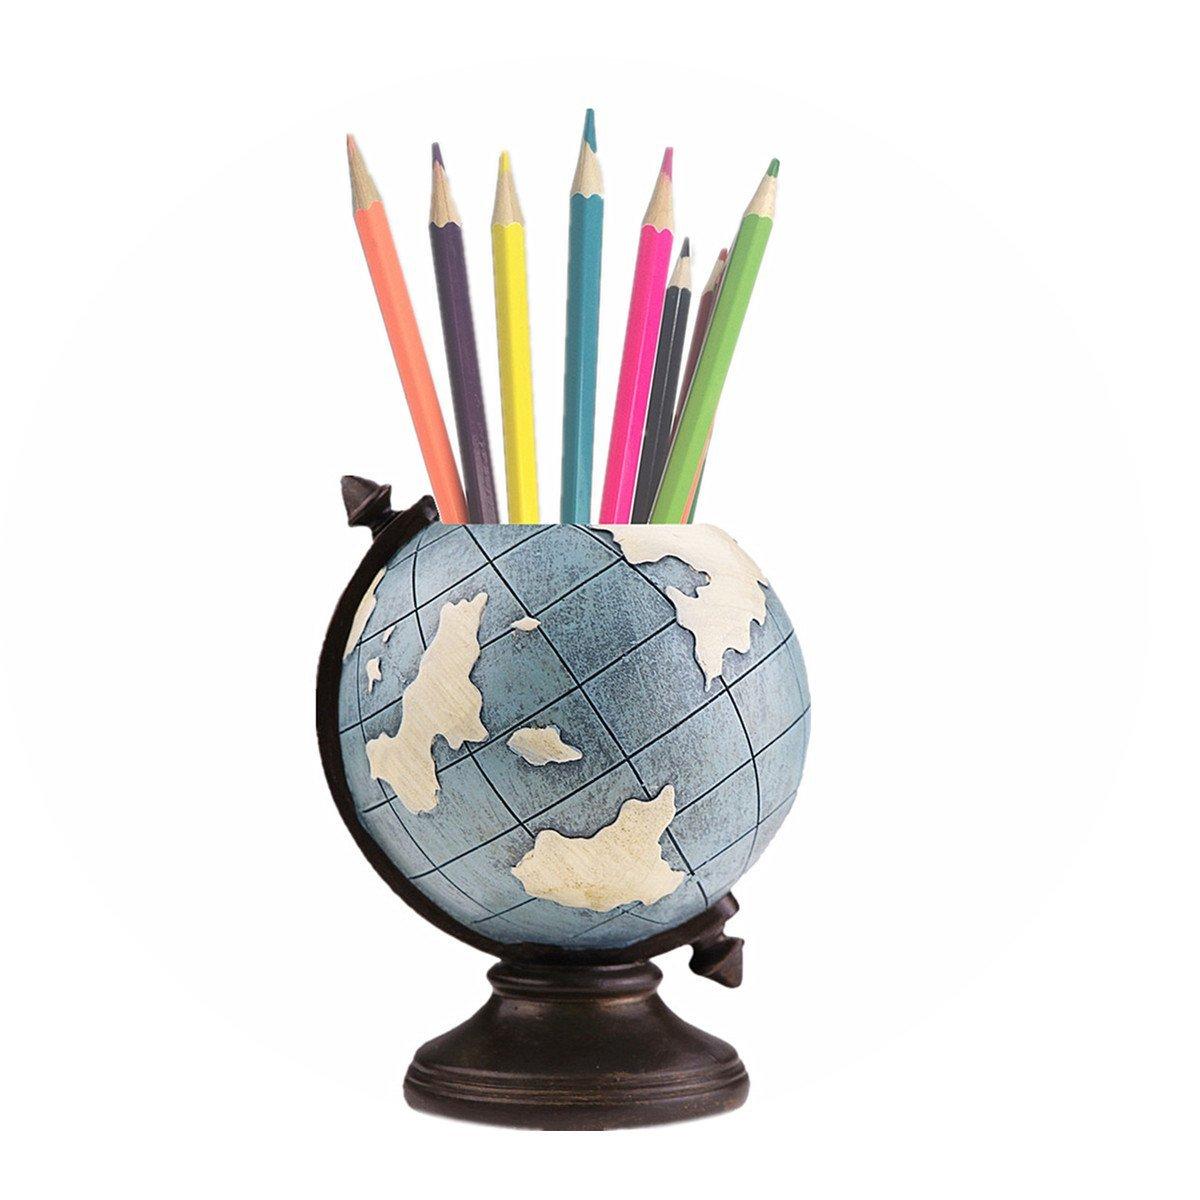 MUAMAX Pen Pencil Holder Resin Desk Globe Stand Multi Purpose Use Pencil Cup Pot Desk Organizer Bookshelf Cabinet Stationery for Home Office Kids Gifts (Blue)